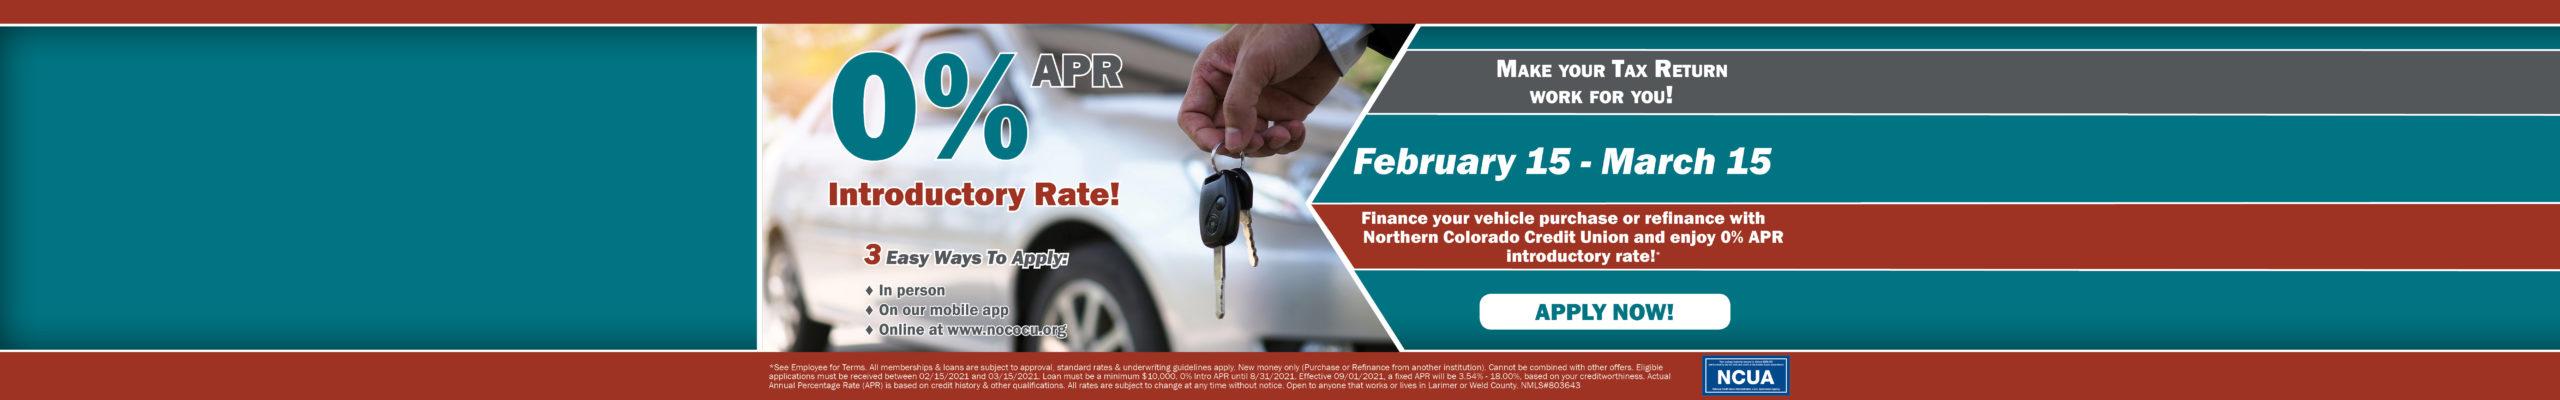 0% Auto Loan